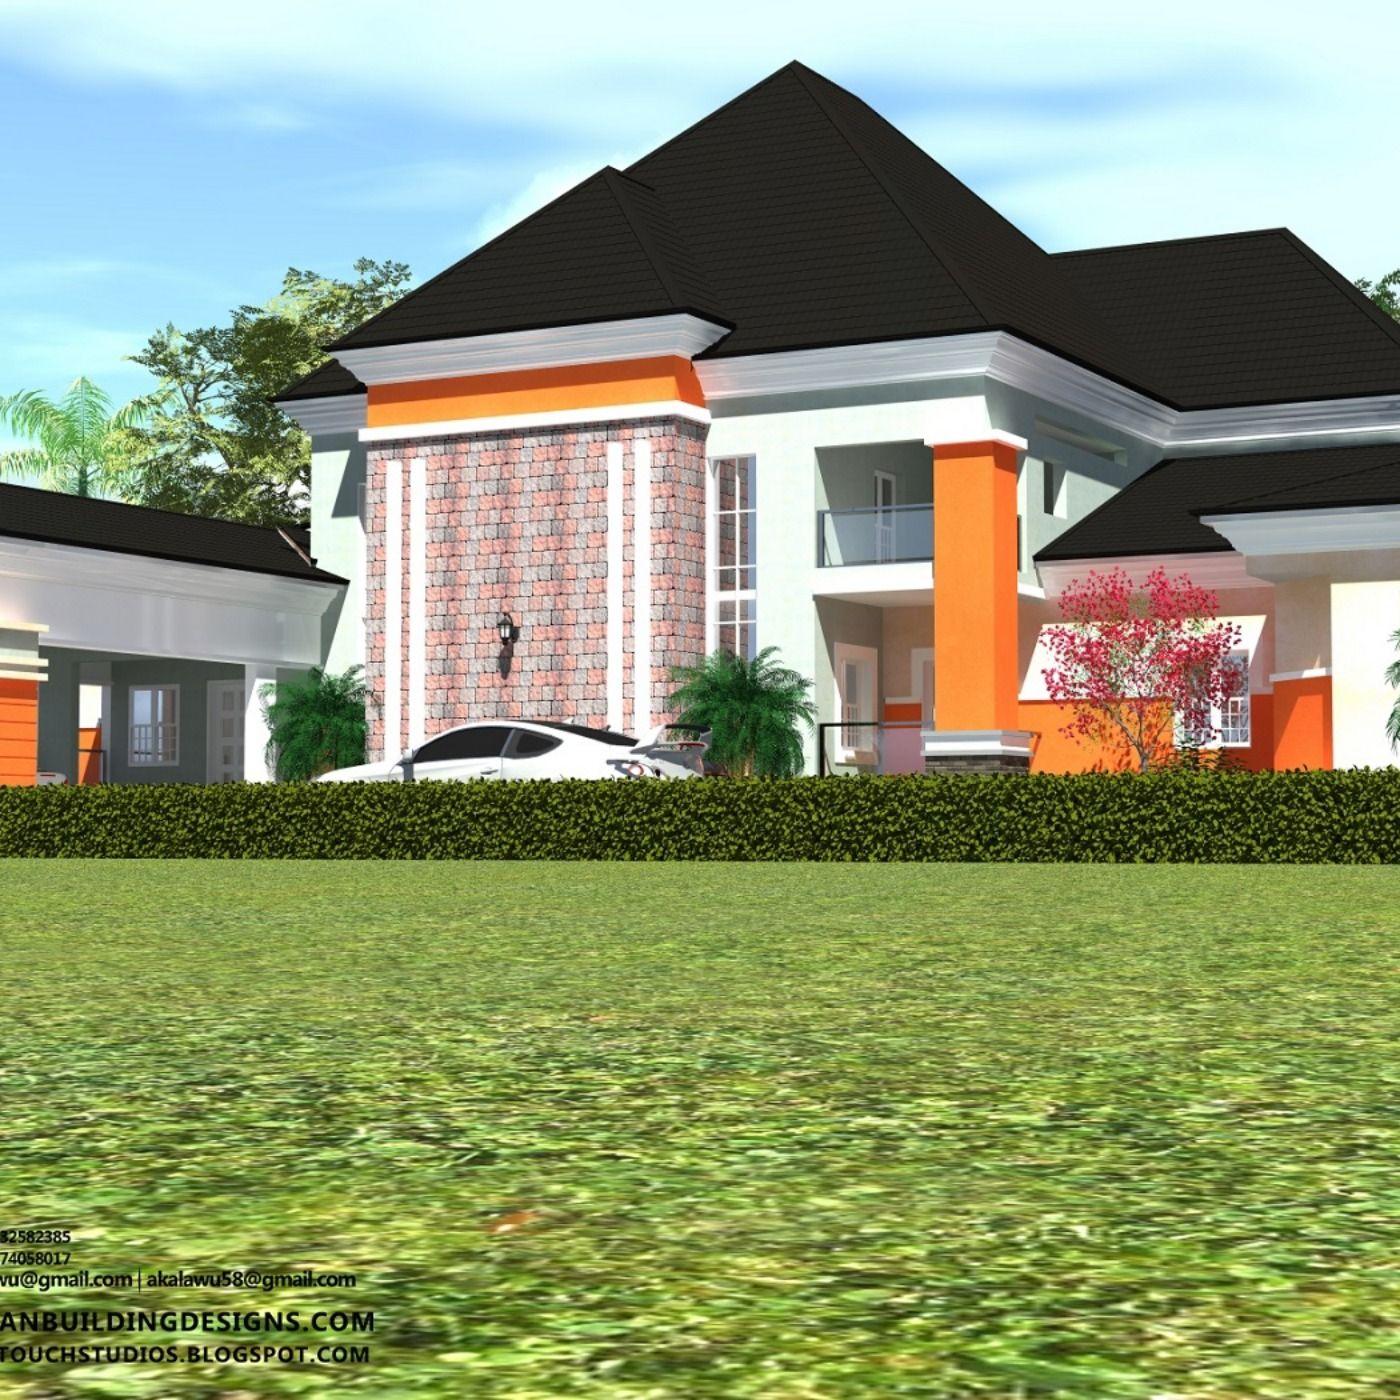 5 Bedroom Beautiful Bungalow With Pent Floor Bungalow House Design Flat Roof House Duplex House Design